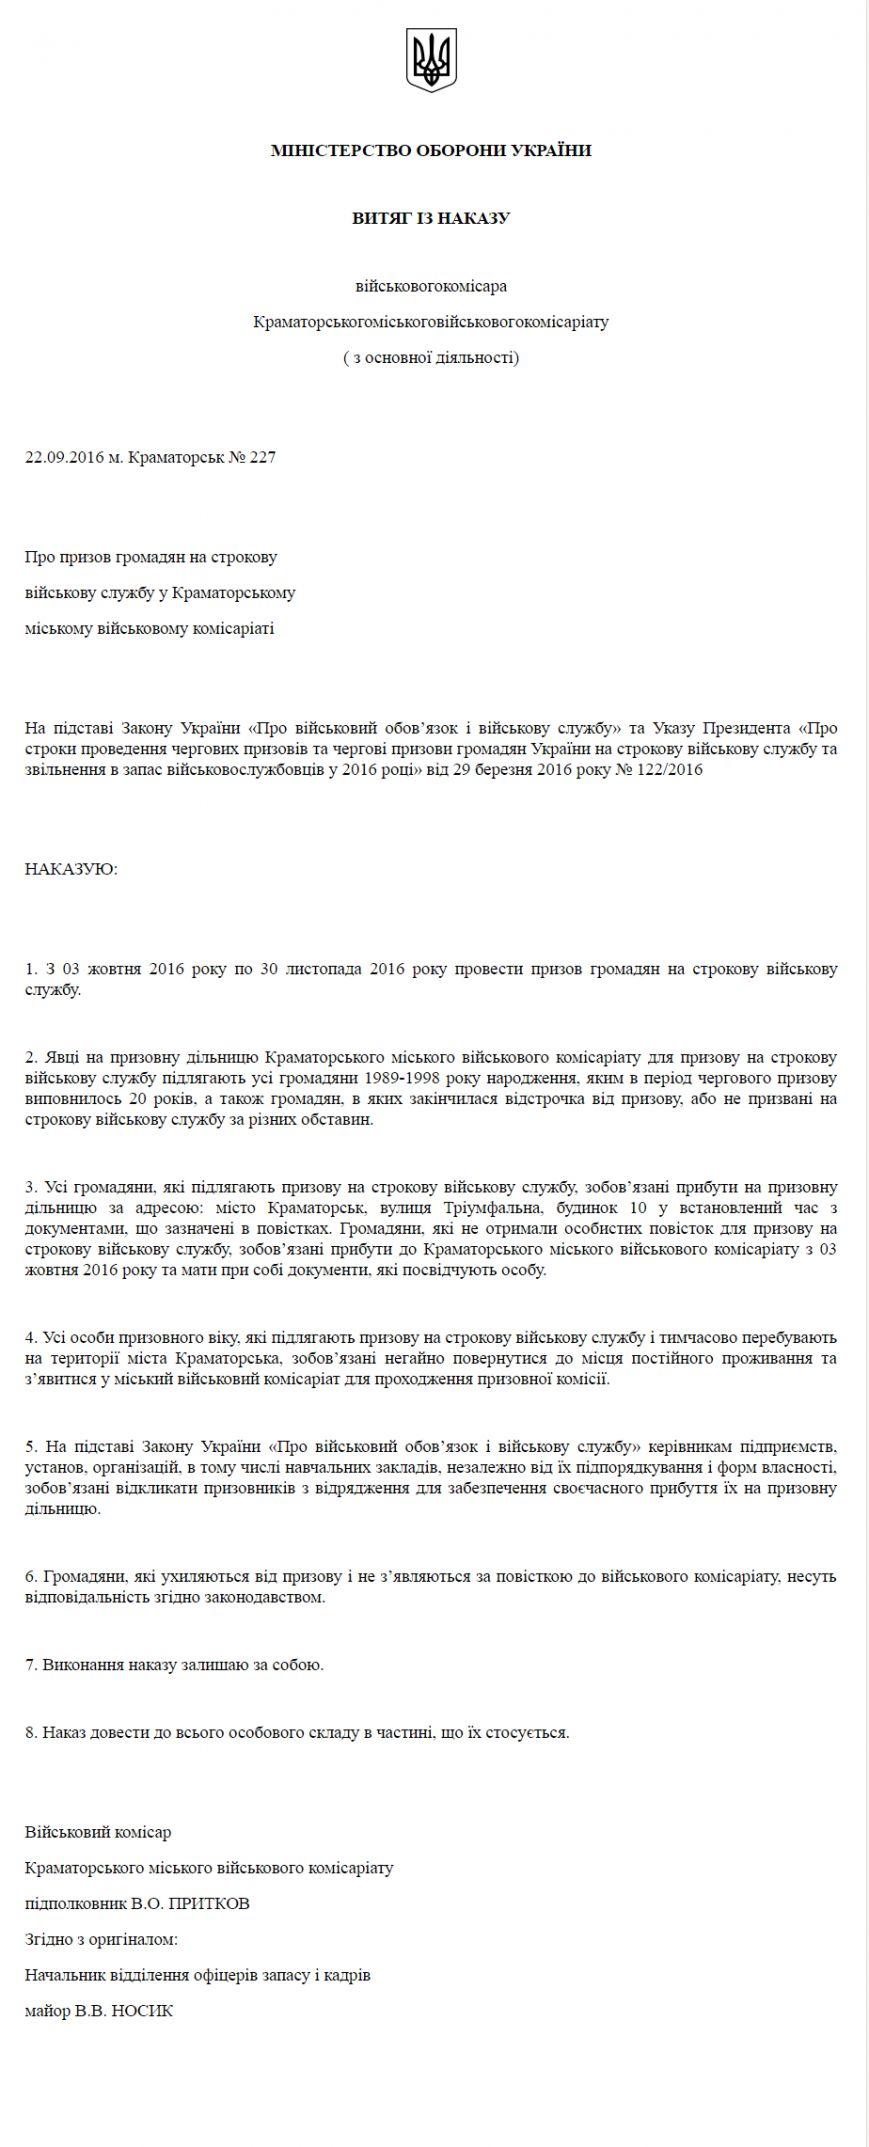 FireShot Capture 4 - Наказ призовДокумент Microsoft Word.docx — Прос_ - https___docviewer.yandex.ru_